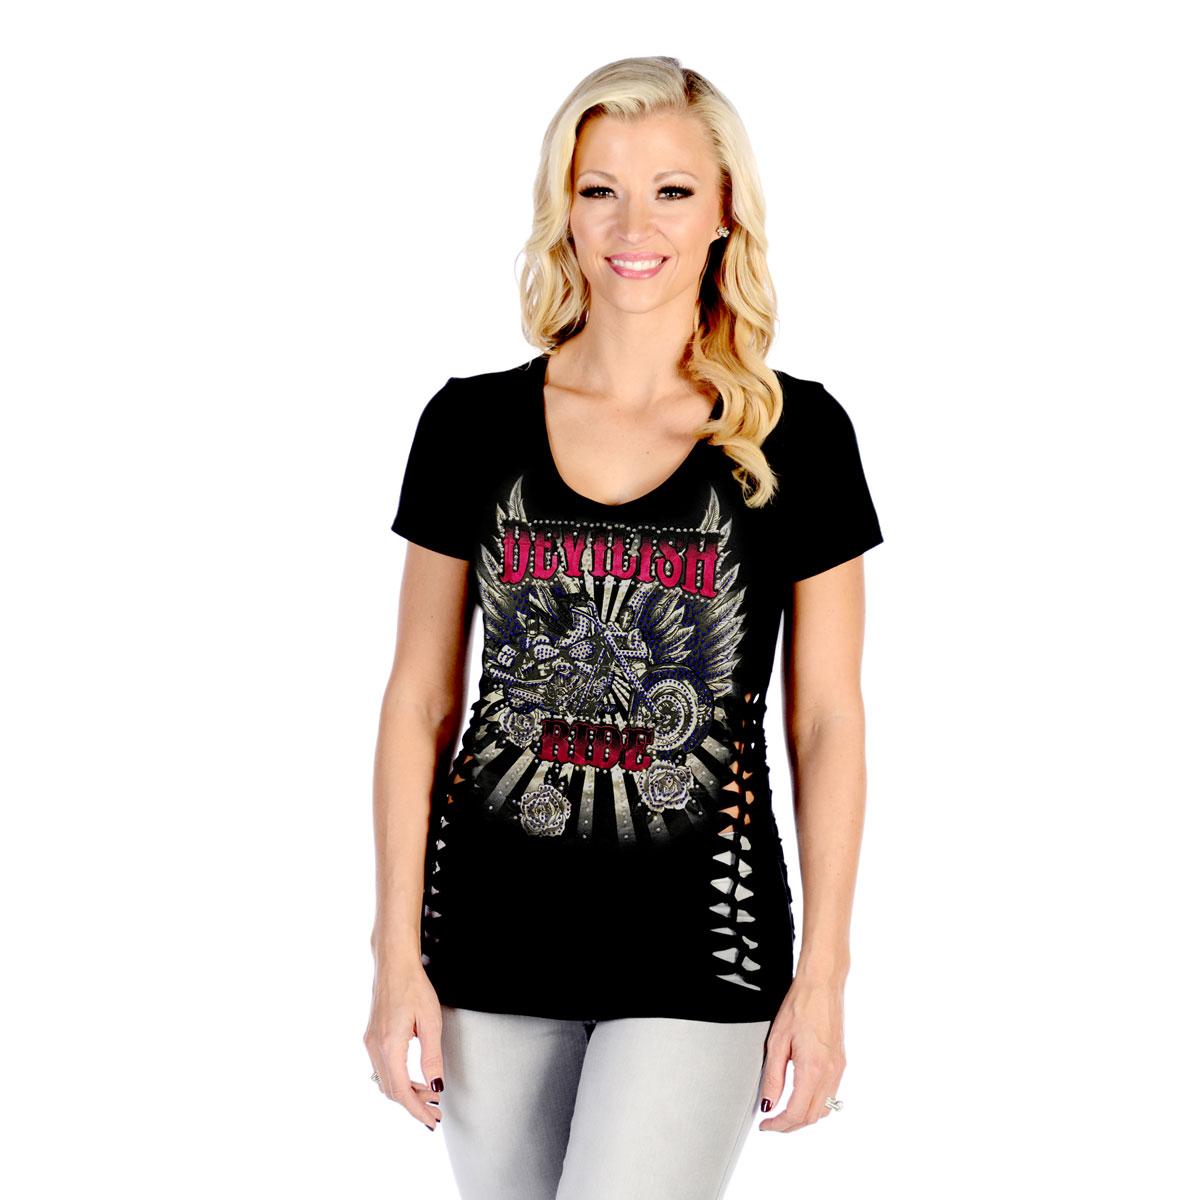 Liberty Wear Women's Devilish Ride Black Top